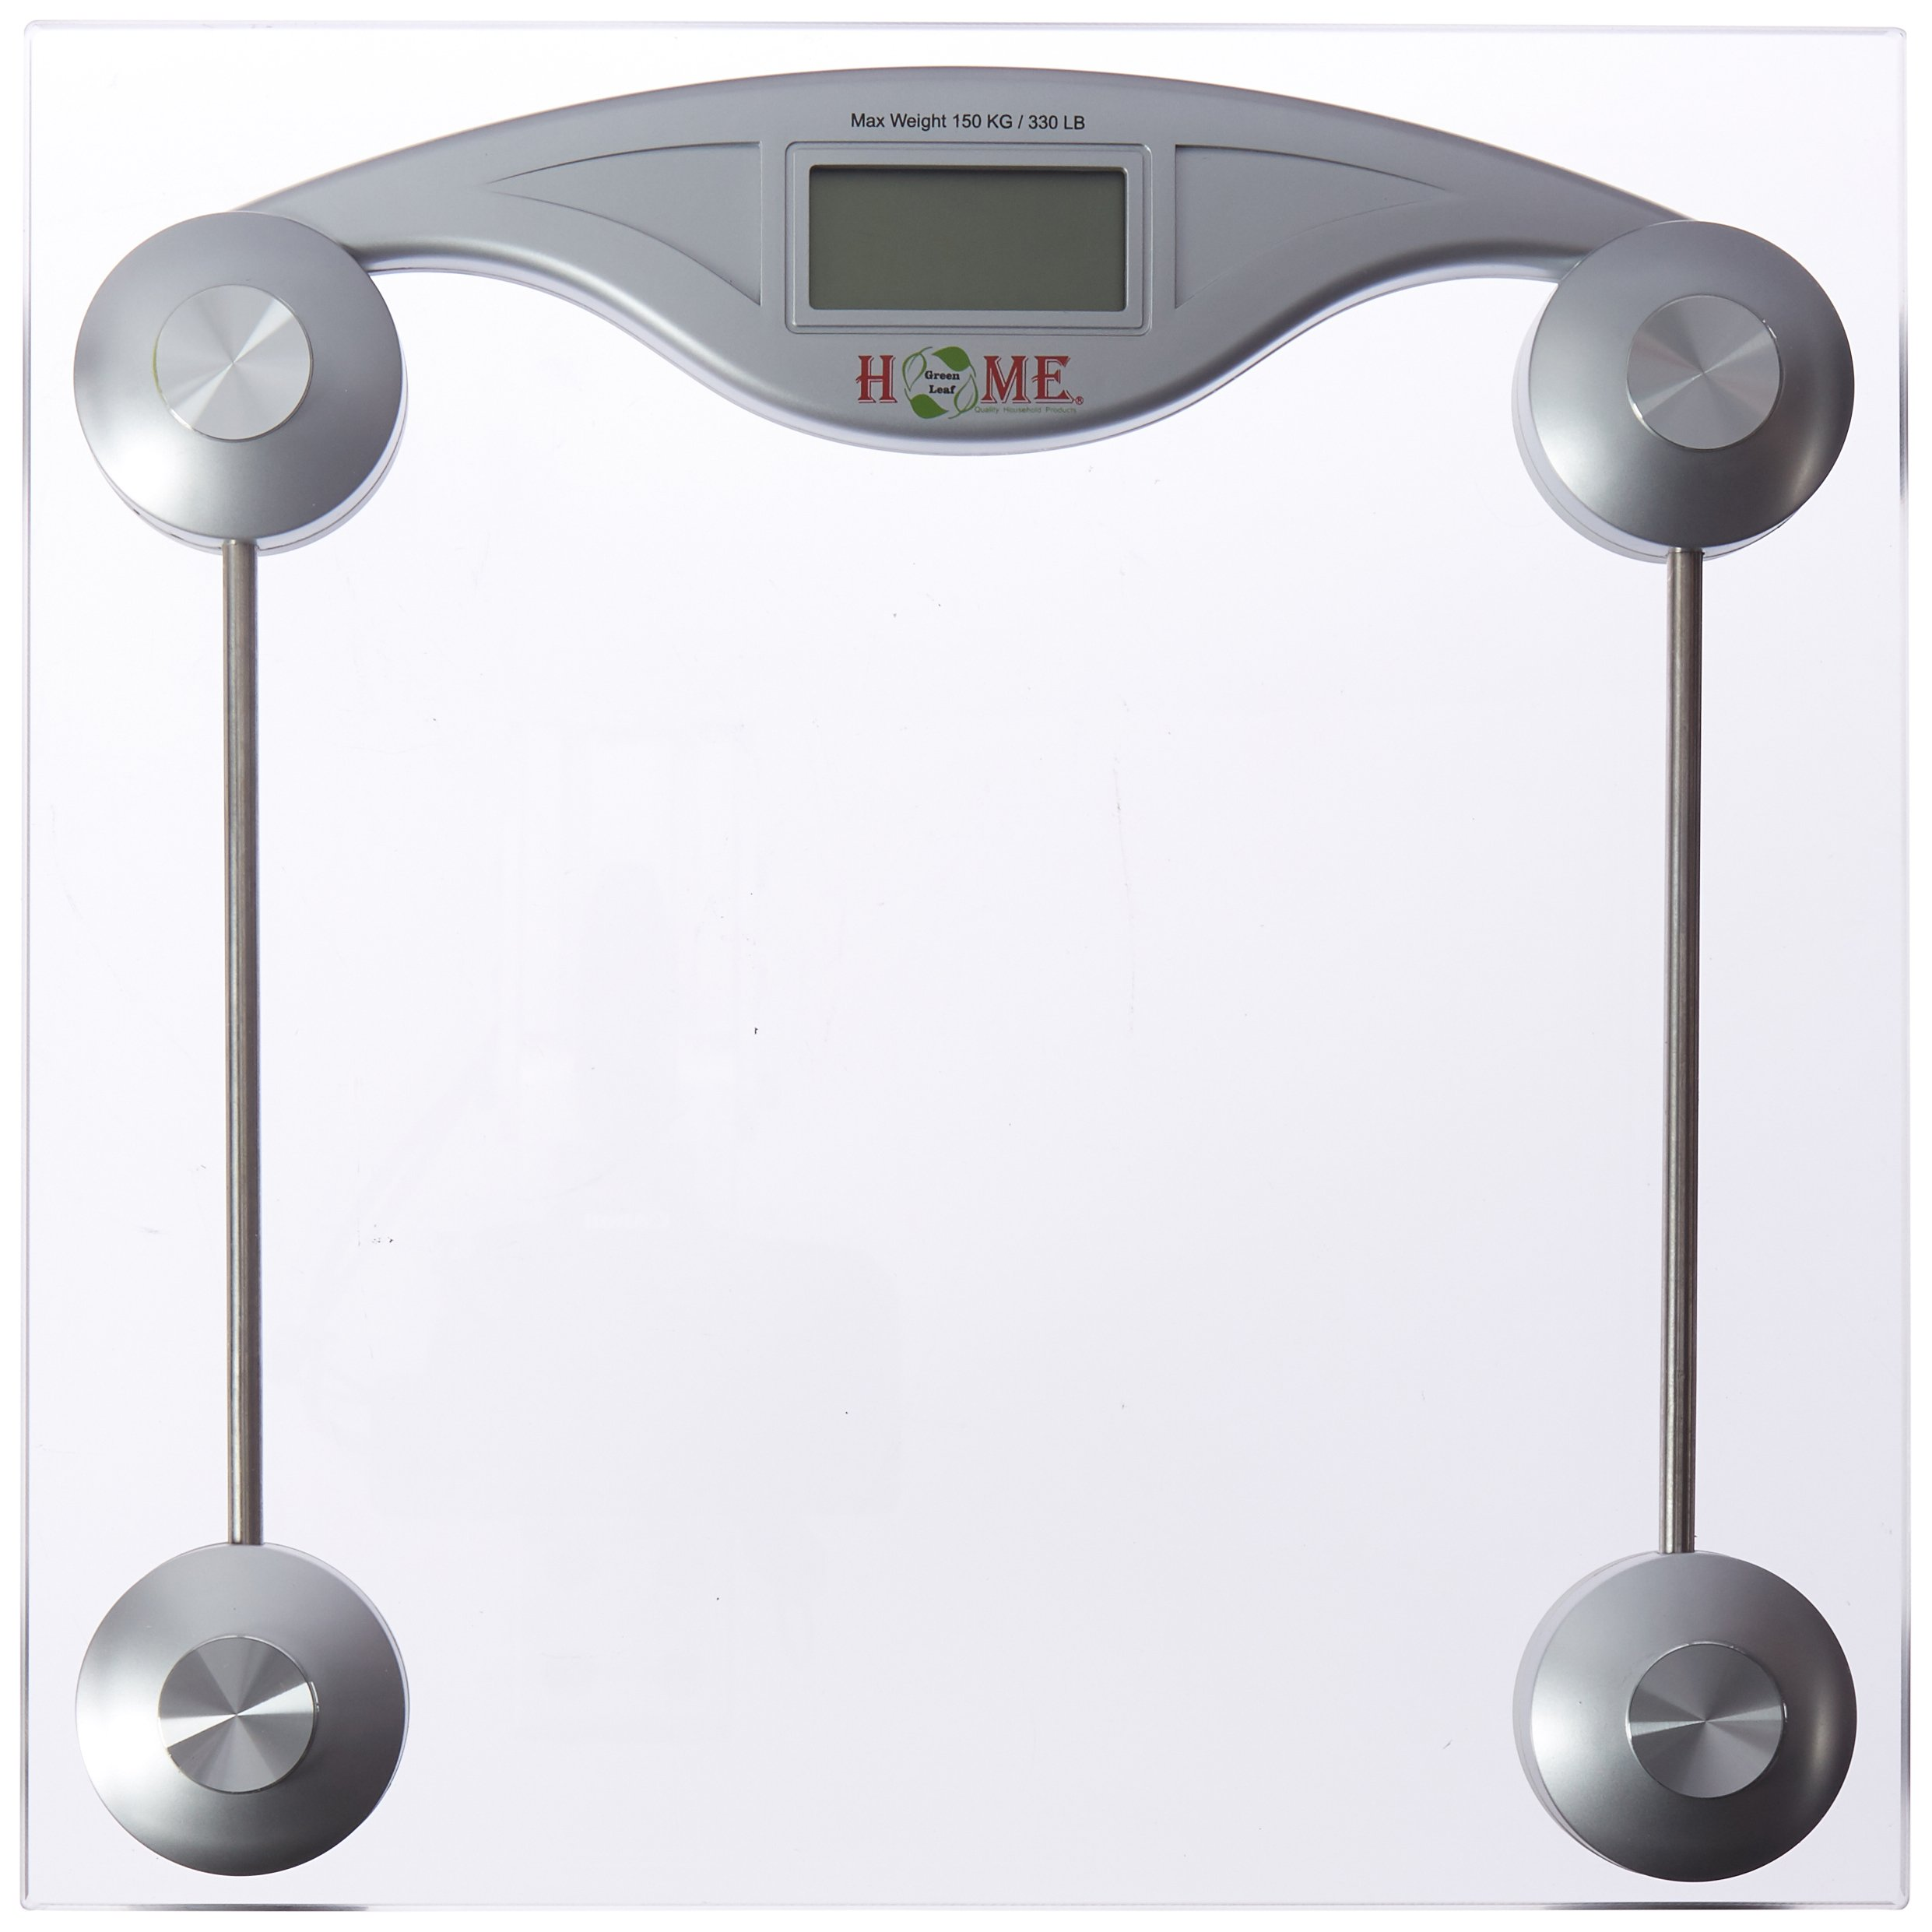 Uniware Digital Square Glass Electronic Scale (Maximum Weight: 150 Kg / 330 Lb) [8503]